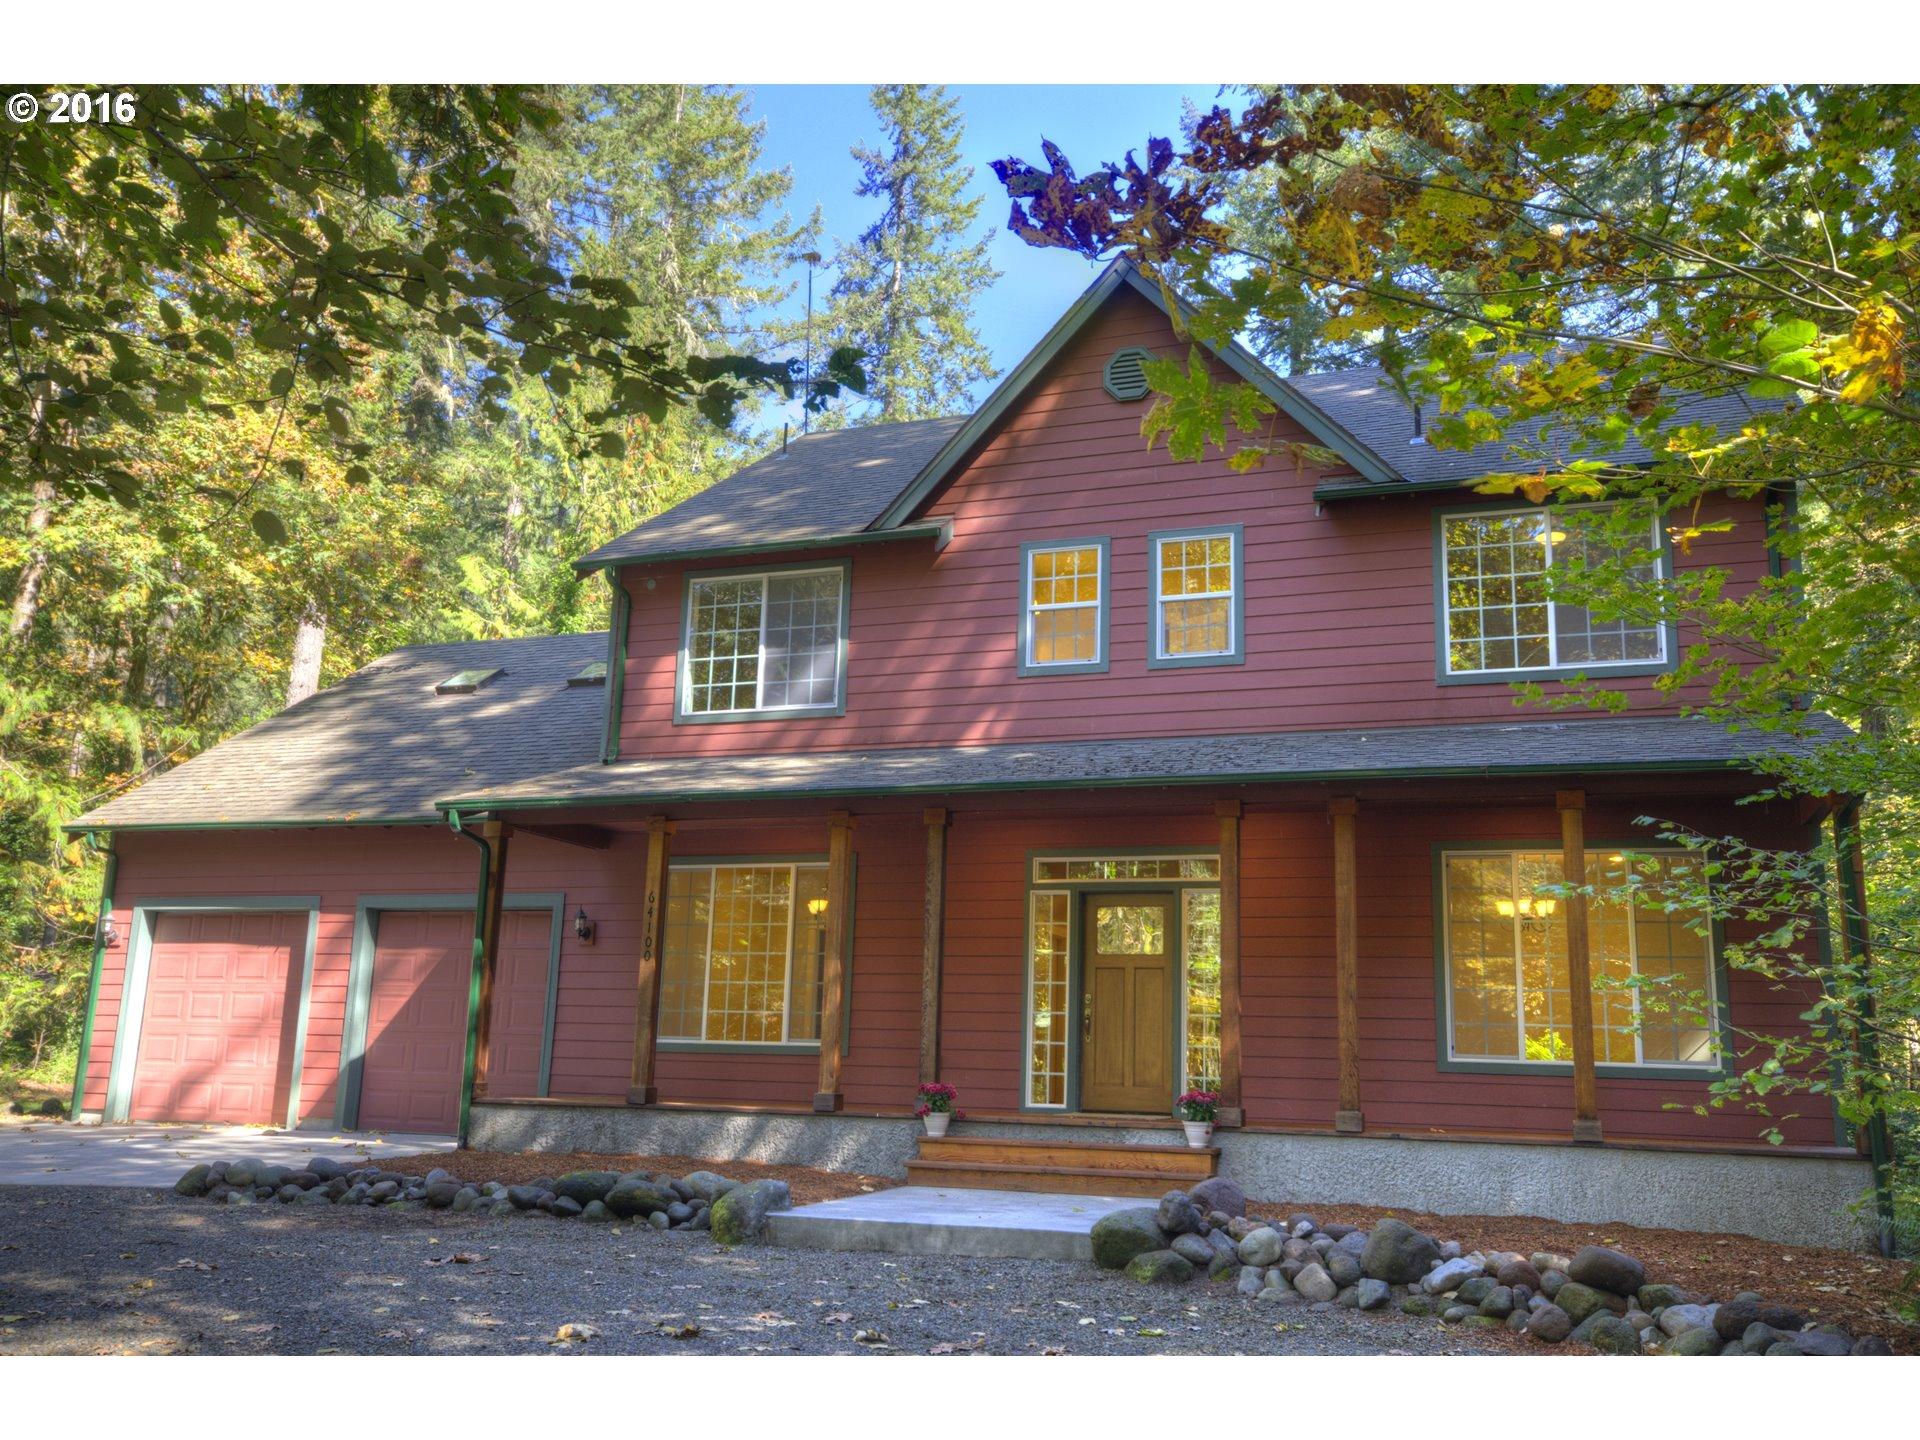 Property Details Property Details Buyer Resources